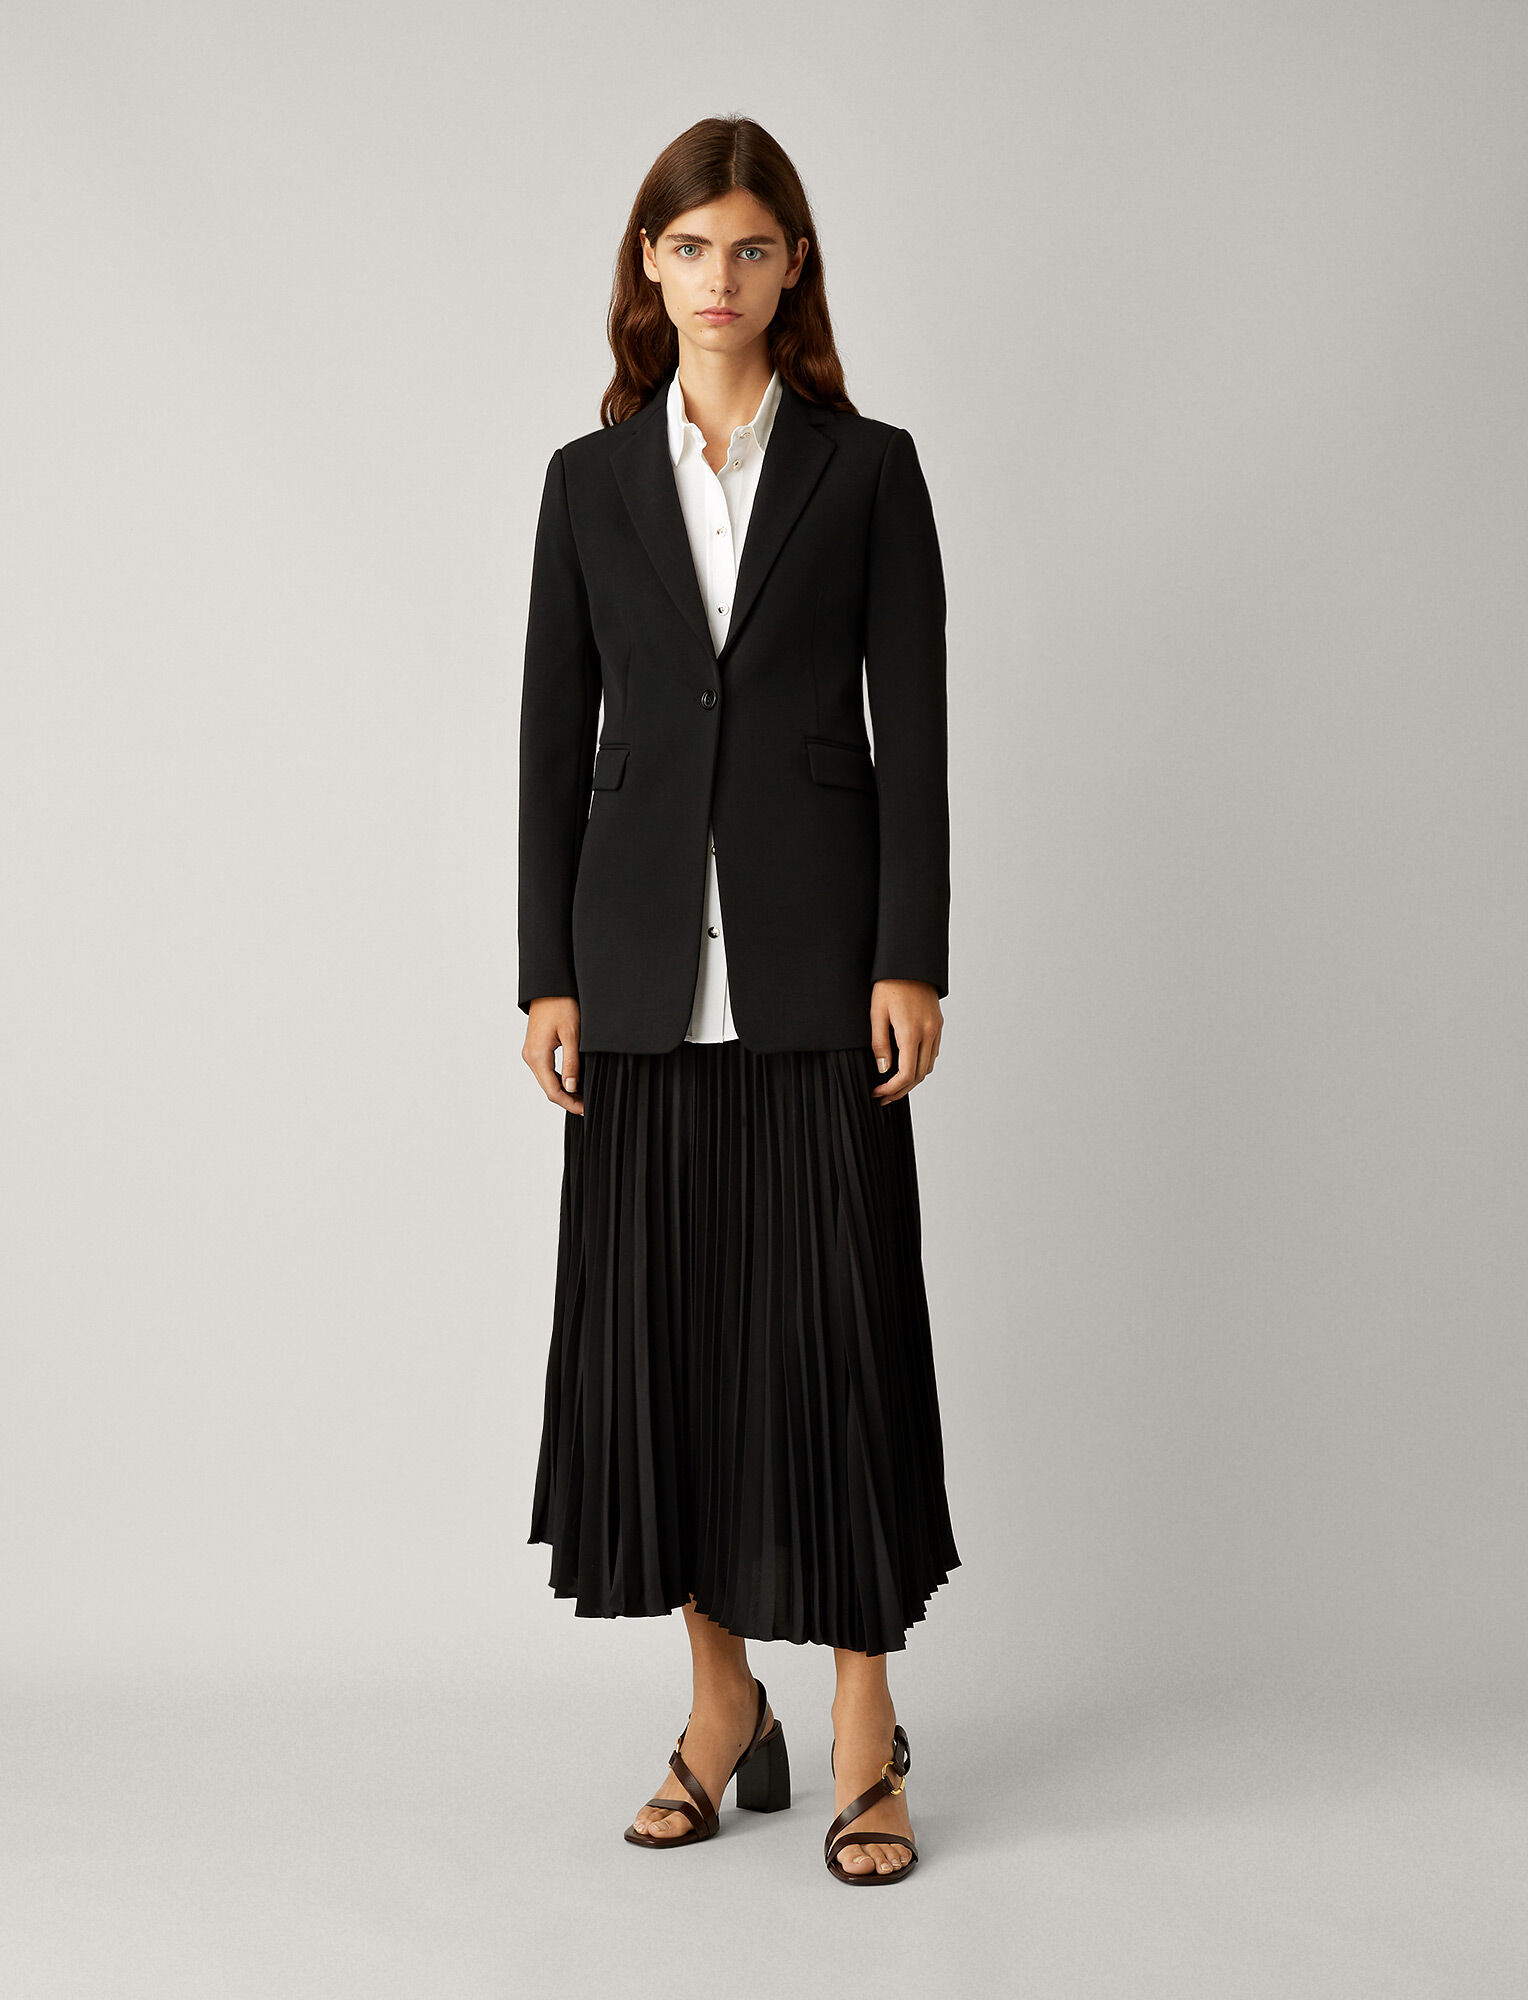 Joseph, Lorenzo Comfort Wool Jacket, in BLACK